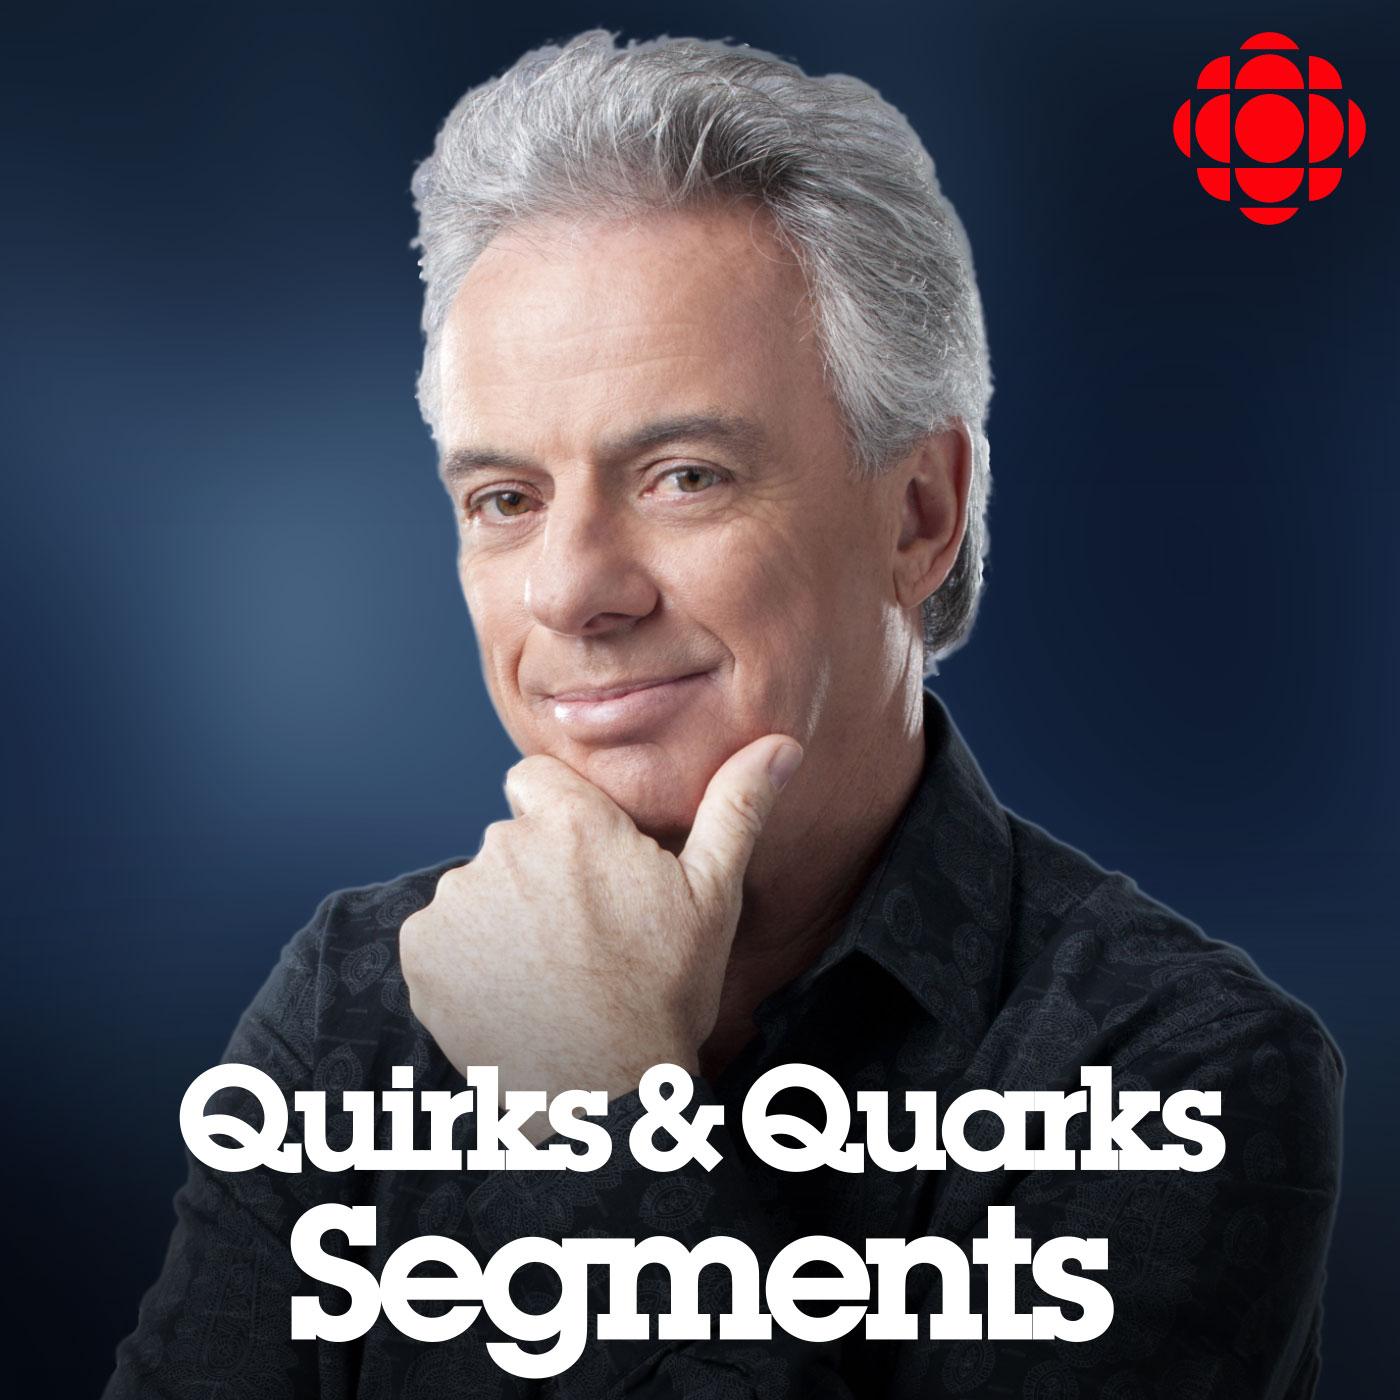 promo-quirks-segments.jpg